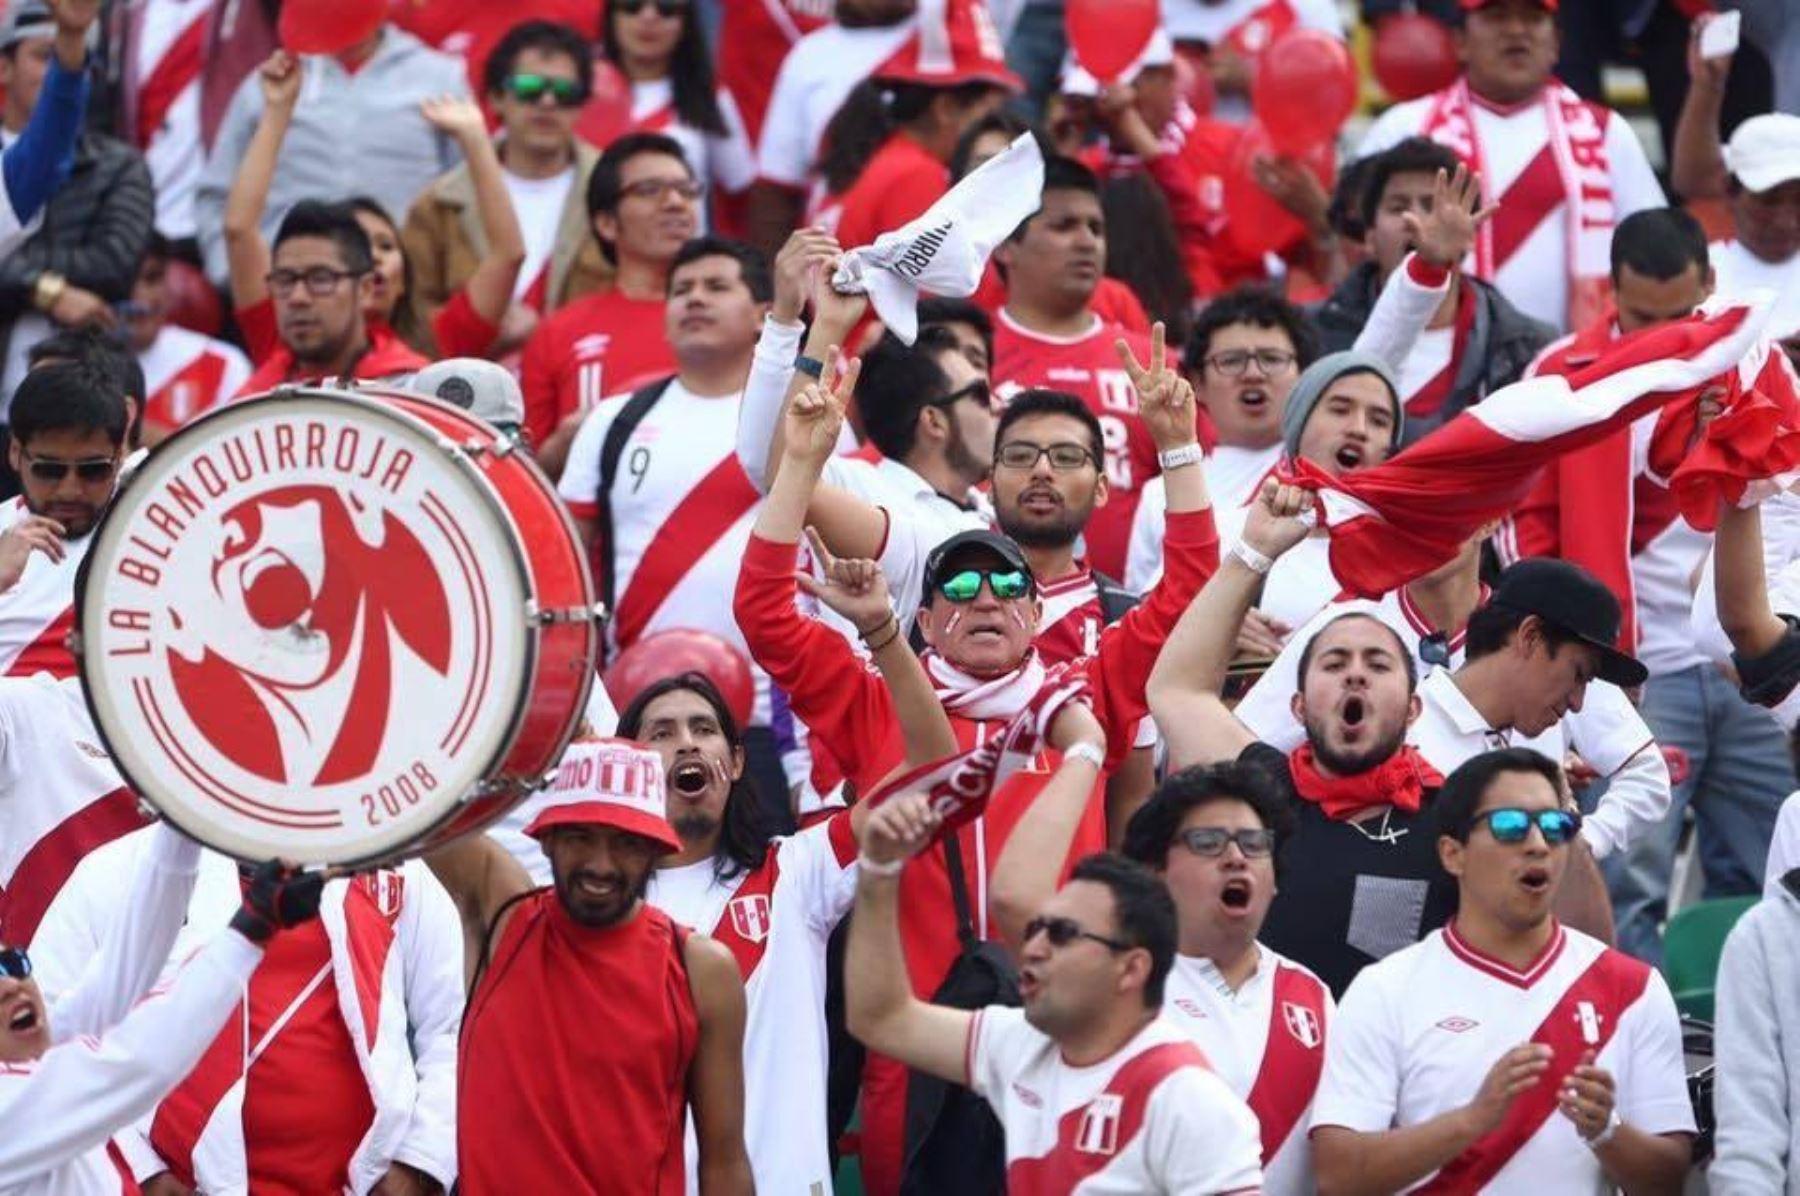 Selección peruana rumbo al Mundial de Rusia 2018.